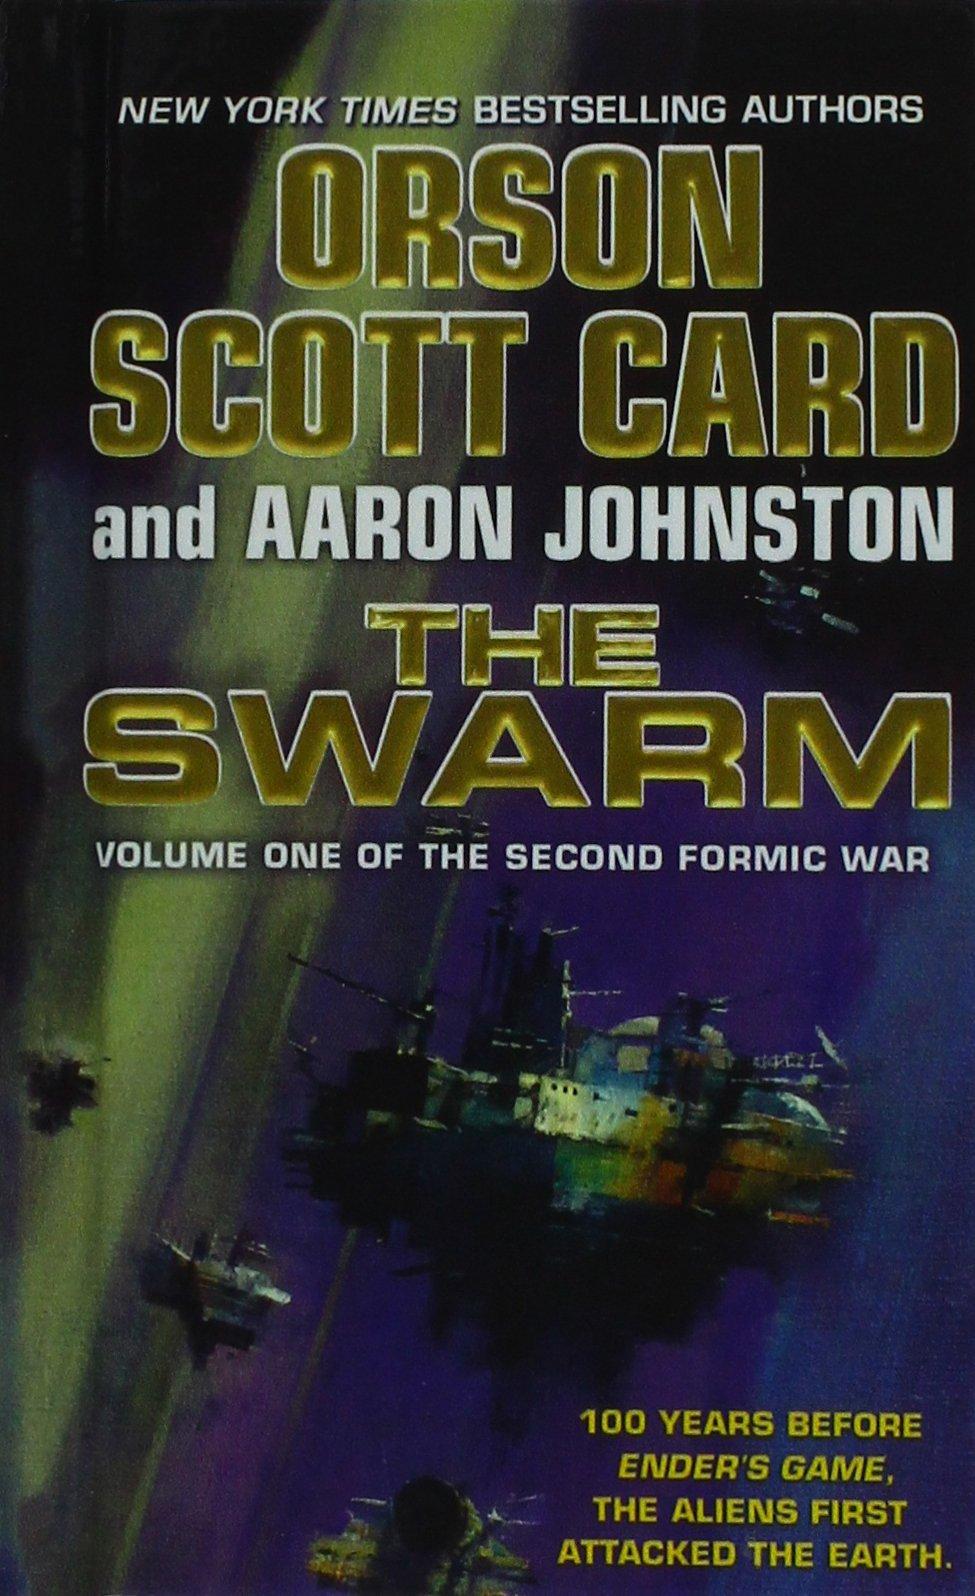 the swarm (card and johnston novel)